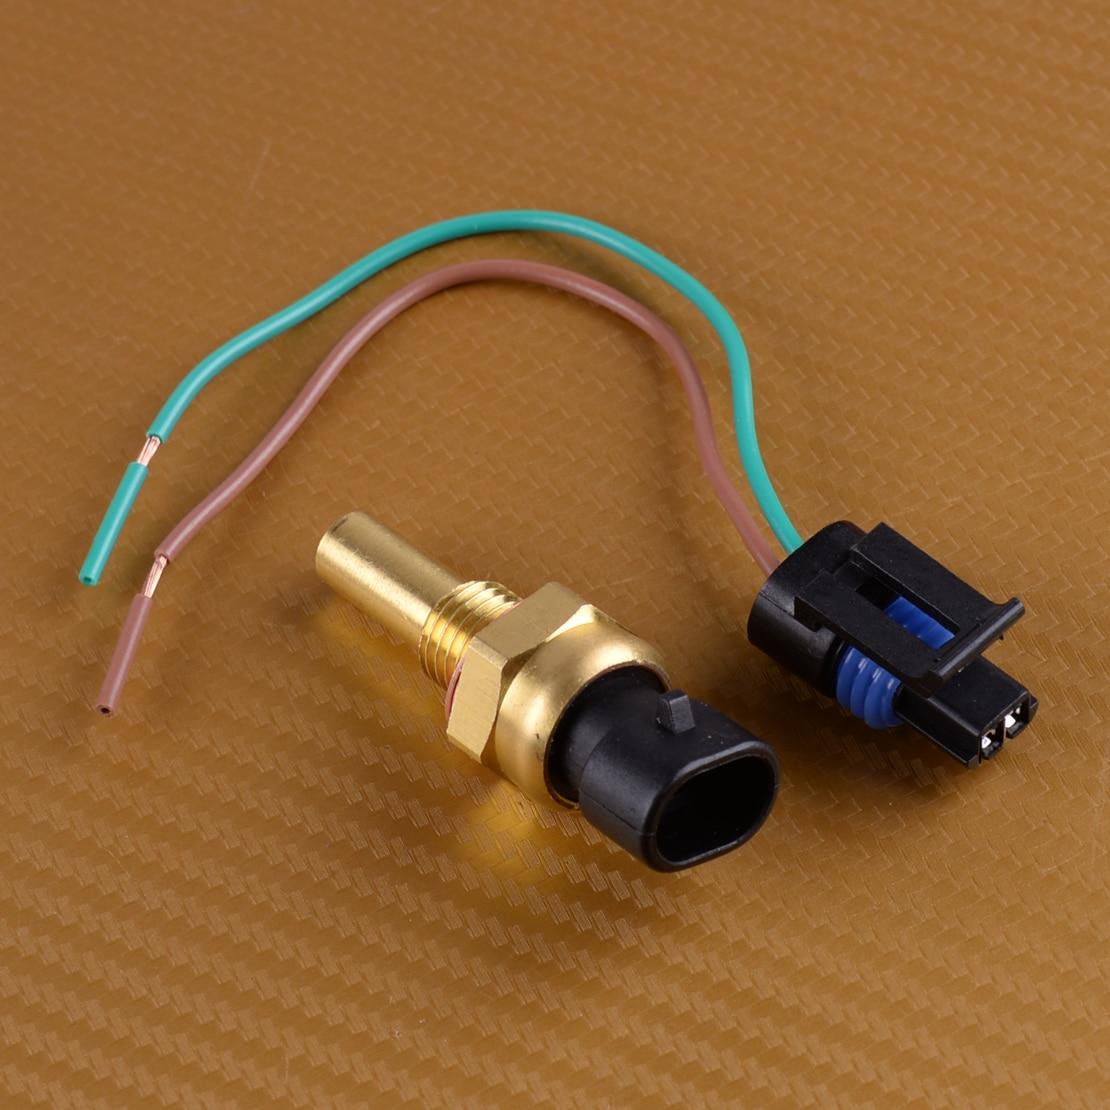 Beler Motor Kühlmittel Temperatur Sensor mit Stecker Fit für Buick Cadillac GMC Daewoo Isuzu Hummer Pontiac 12162193 15326388